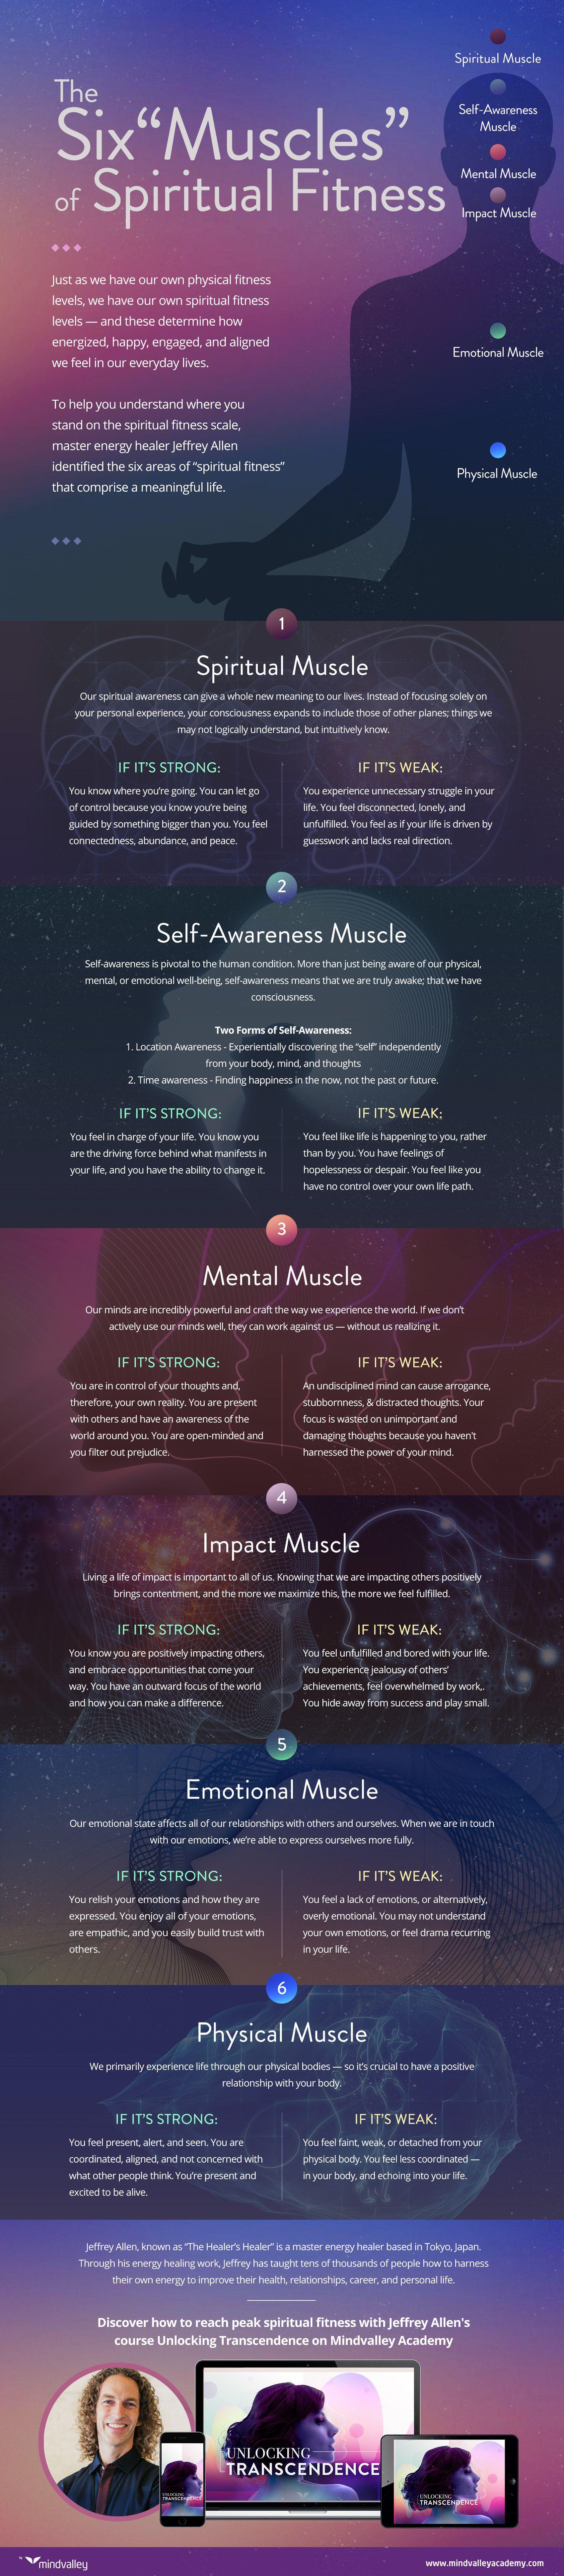 Jeffrey allen 6 muscles of spiritual fitness infographic.